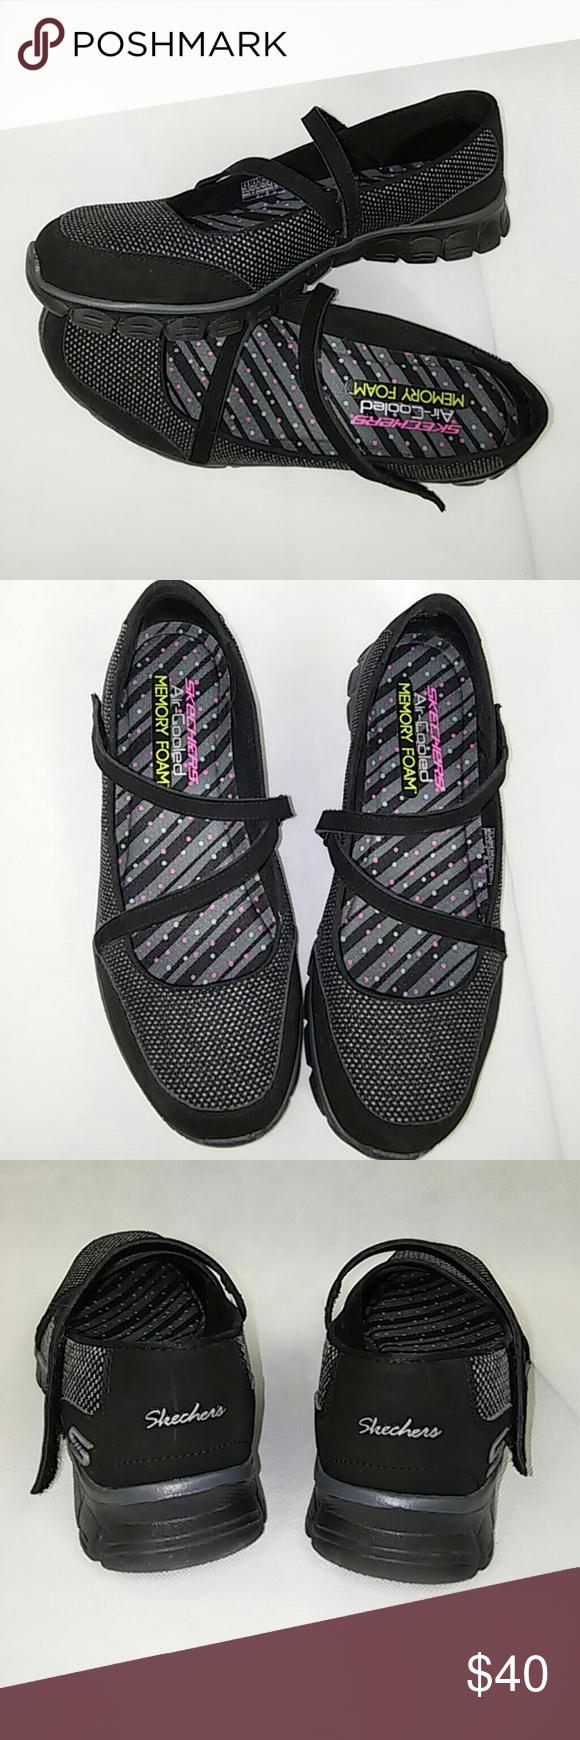 Skechers Air Cooled Memory Foam Shoes Memory Foam Shoes